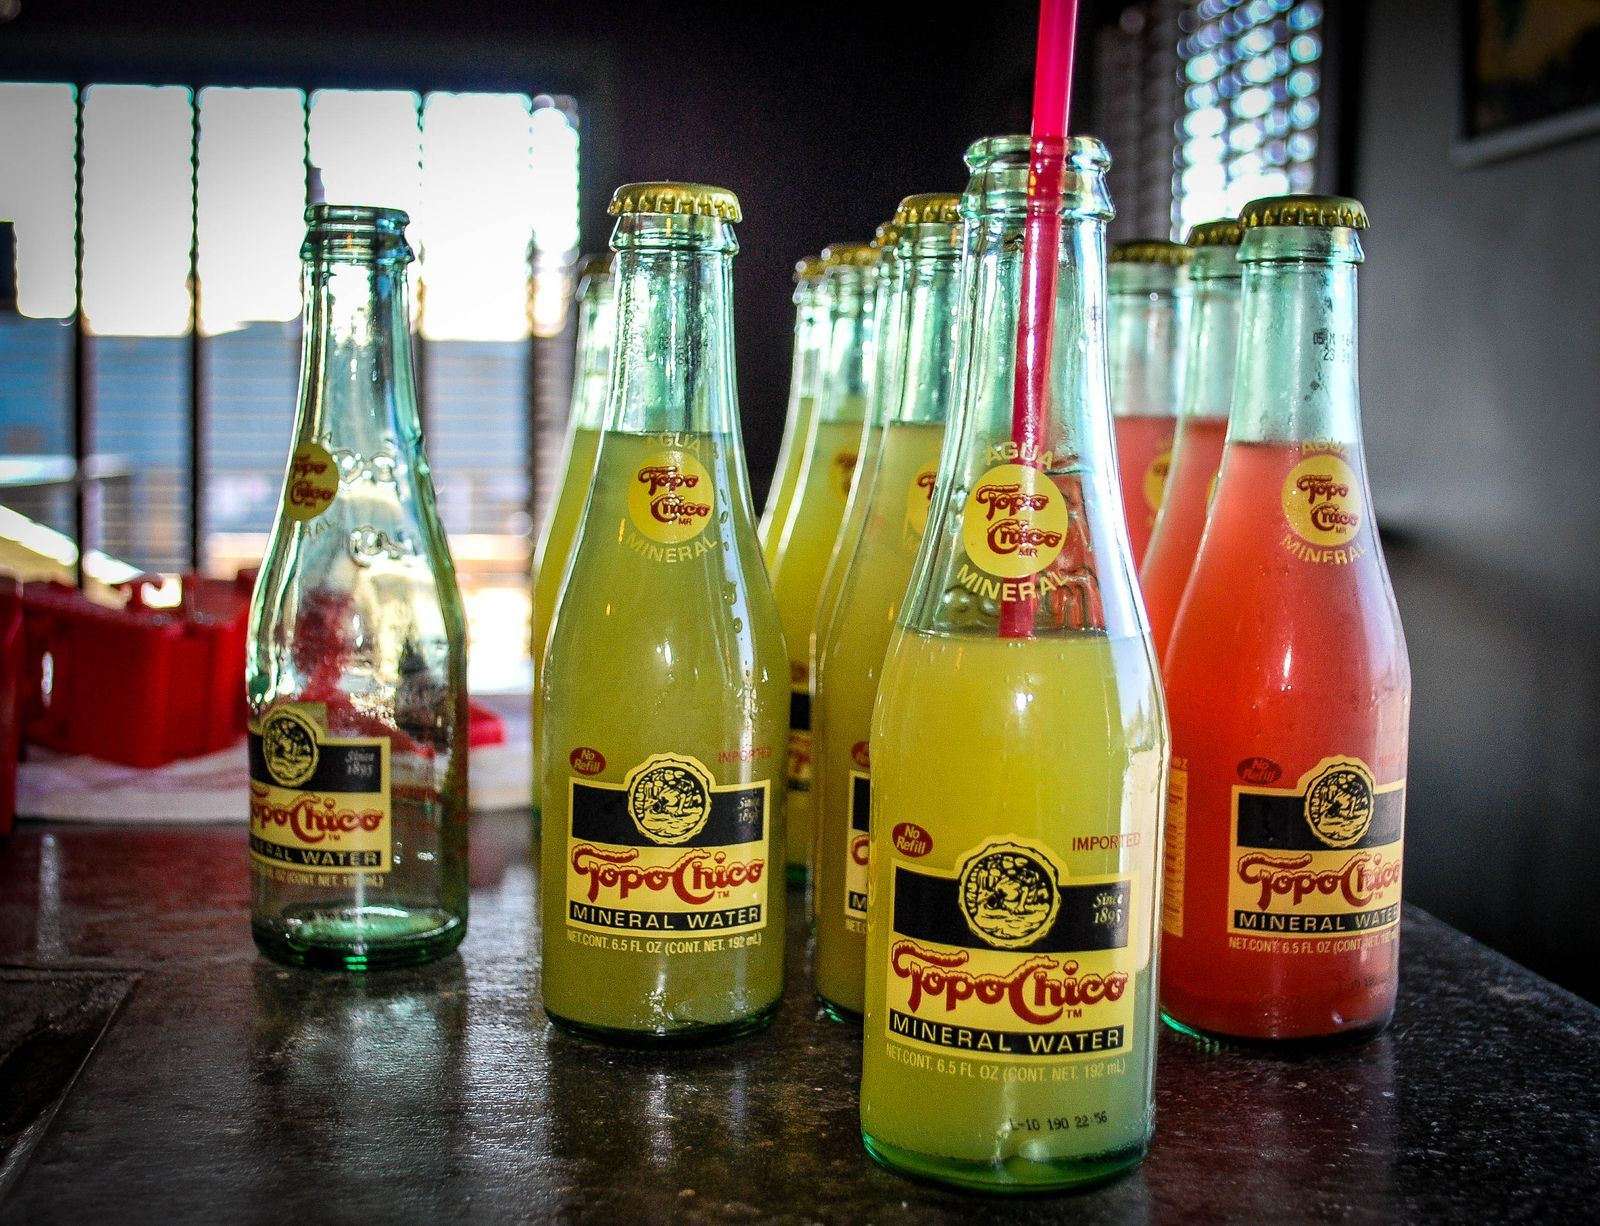 Royal Jelly's bottled cocktails